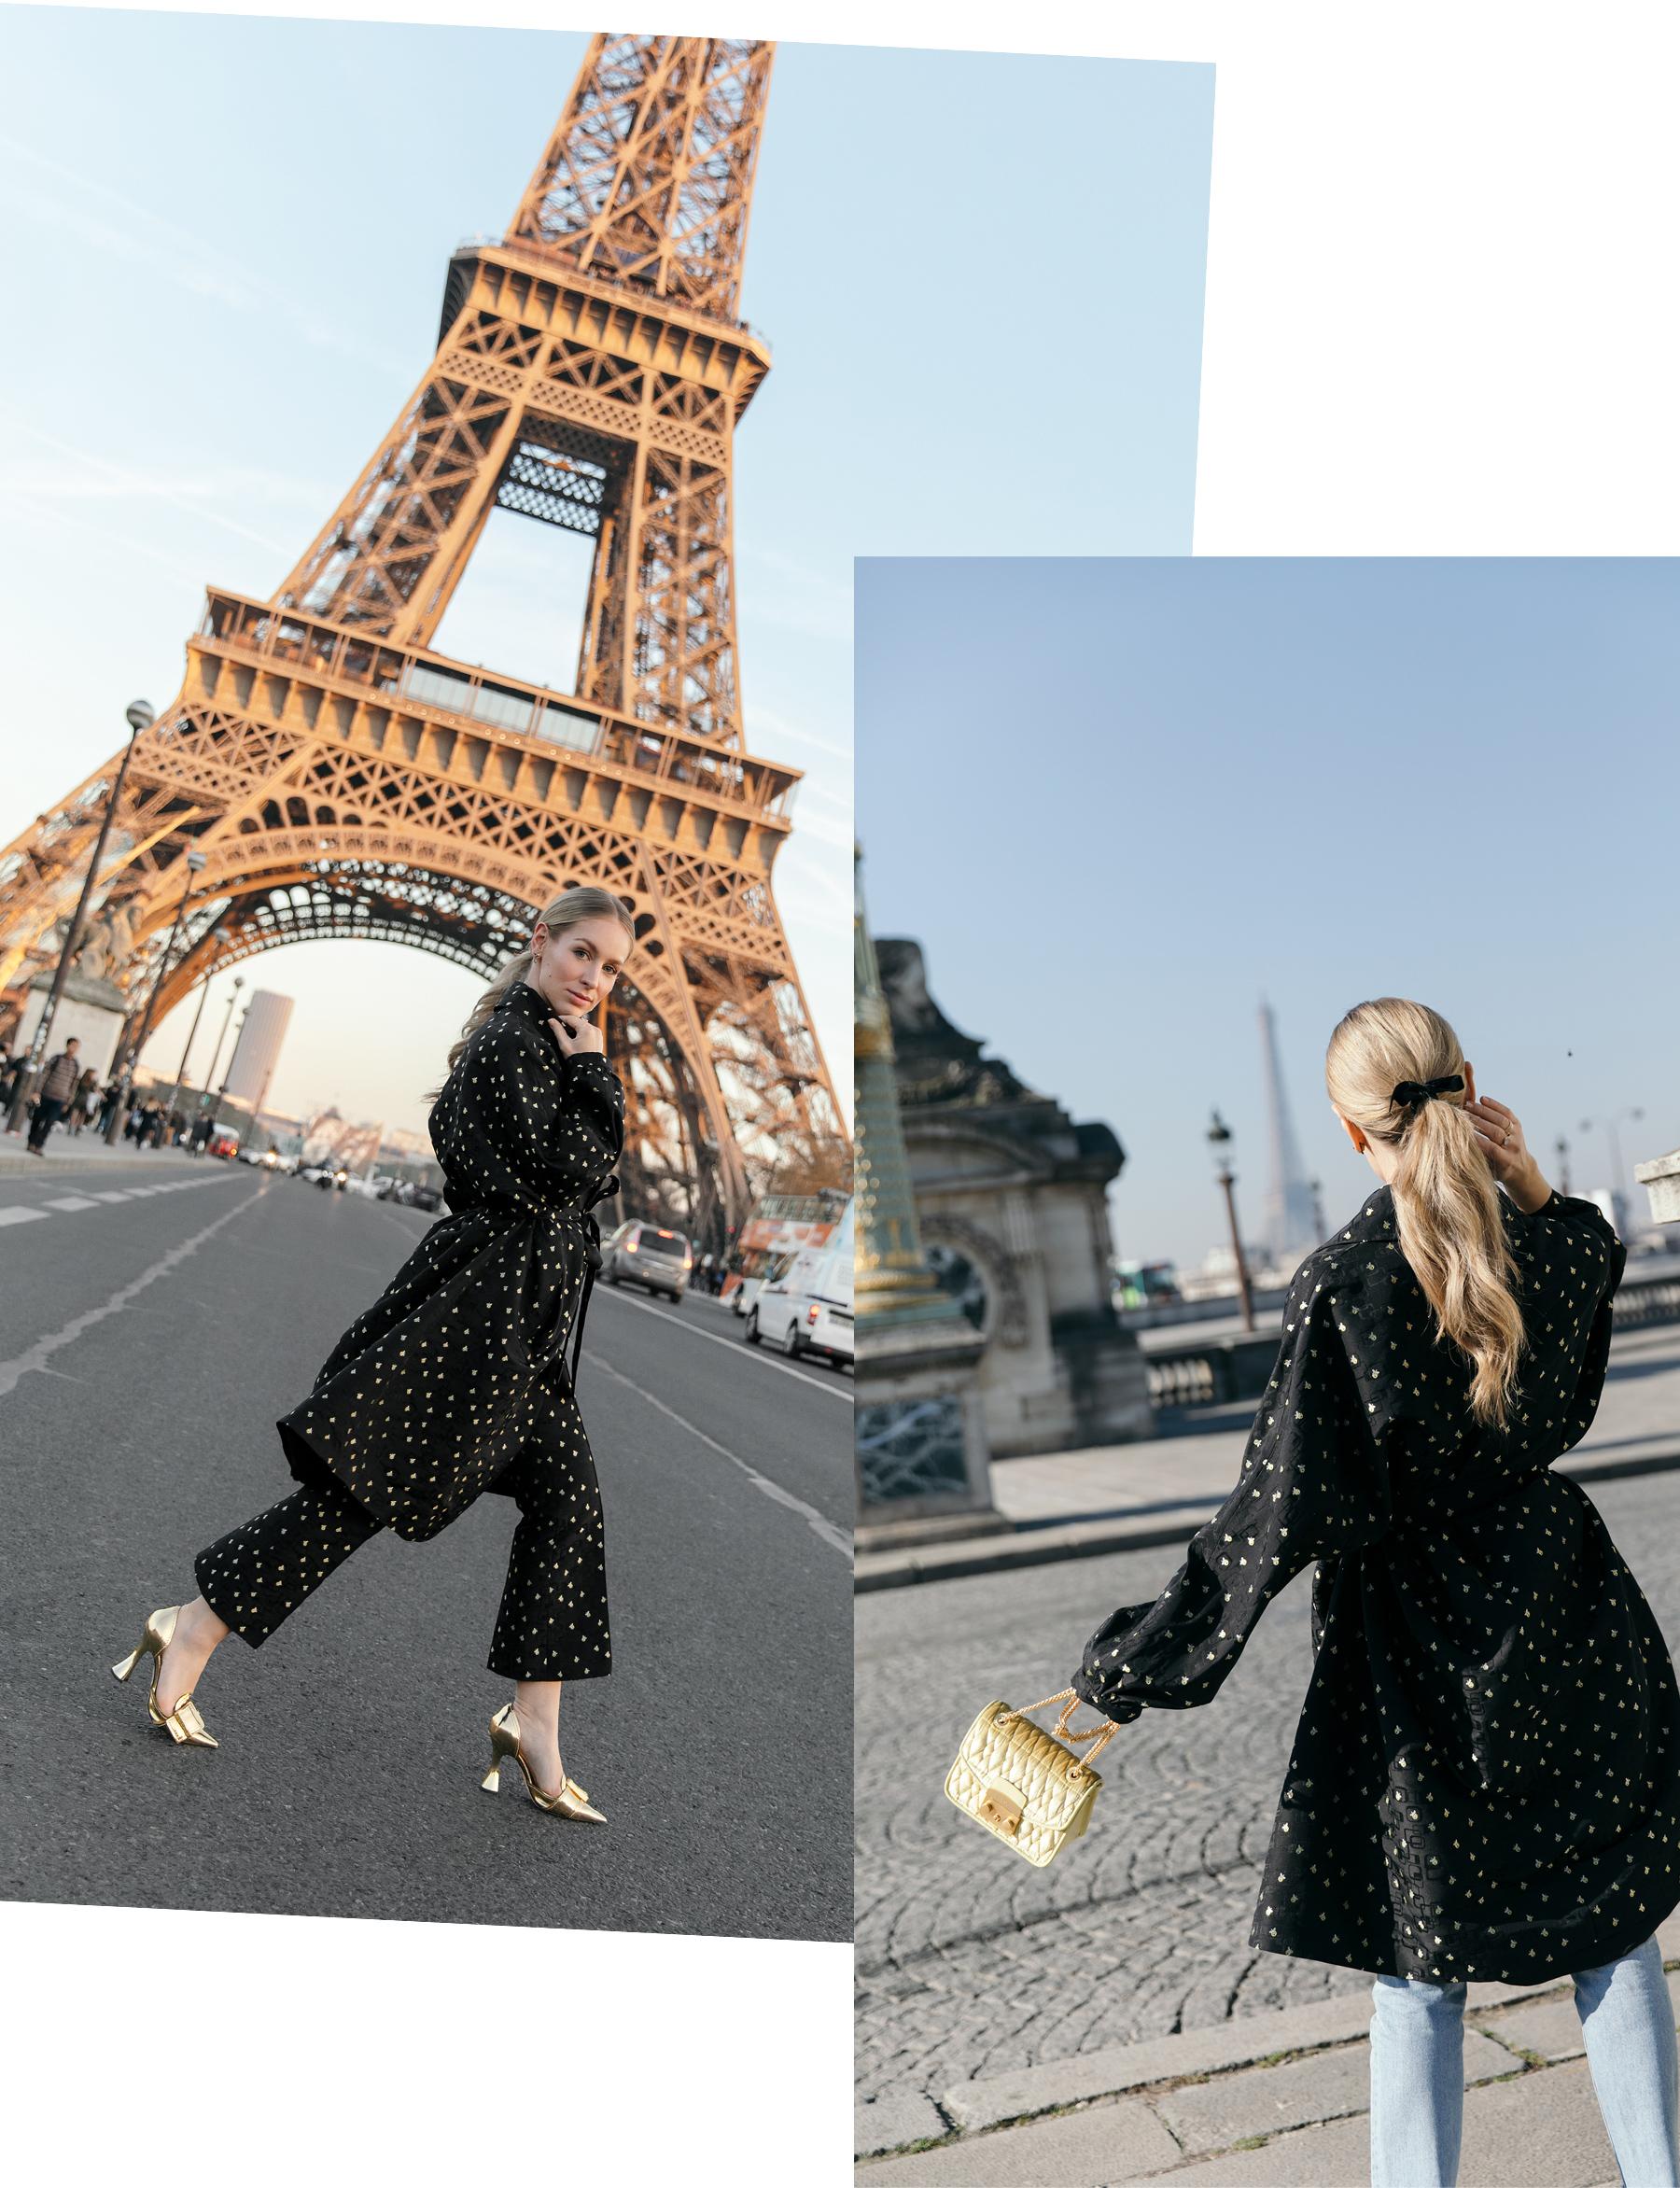 ParisFashionWeek_CarinOlsson_05.jpg